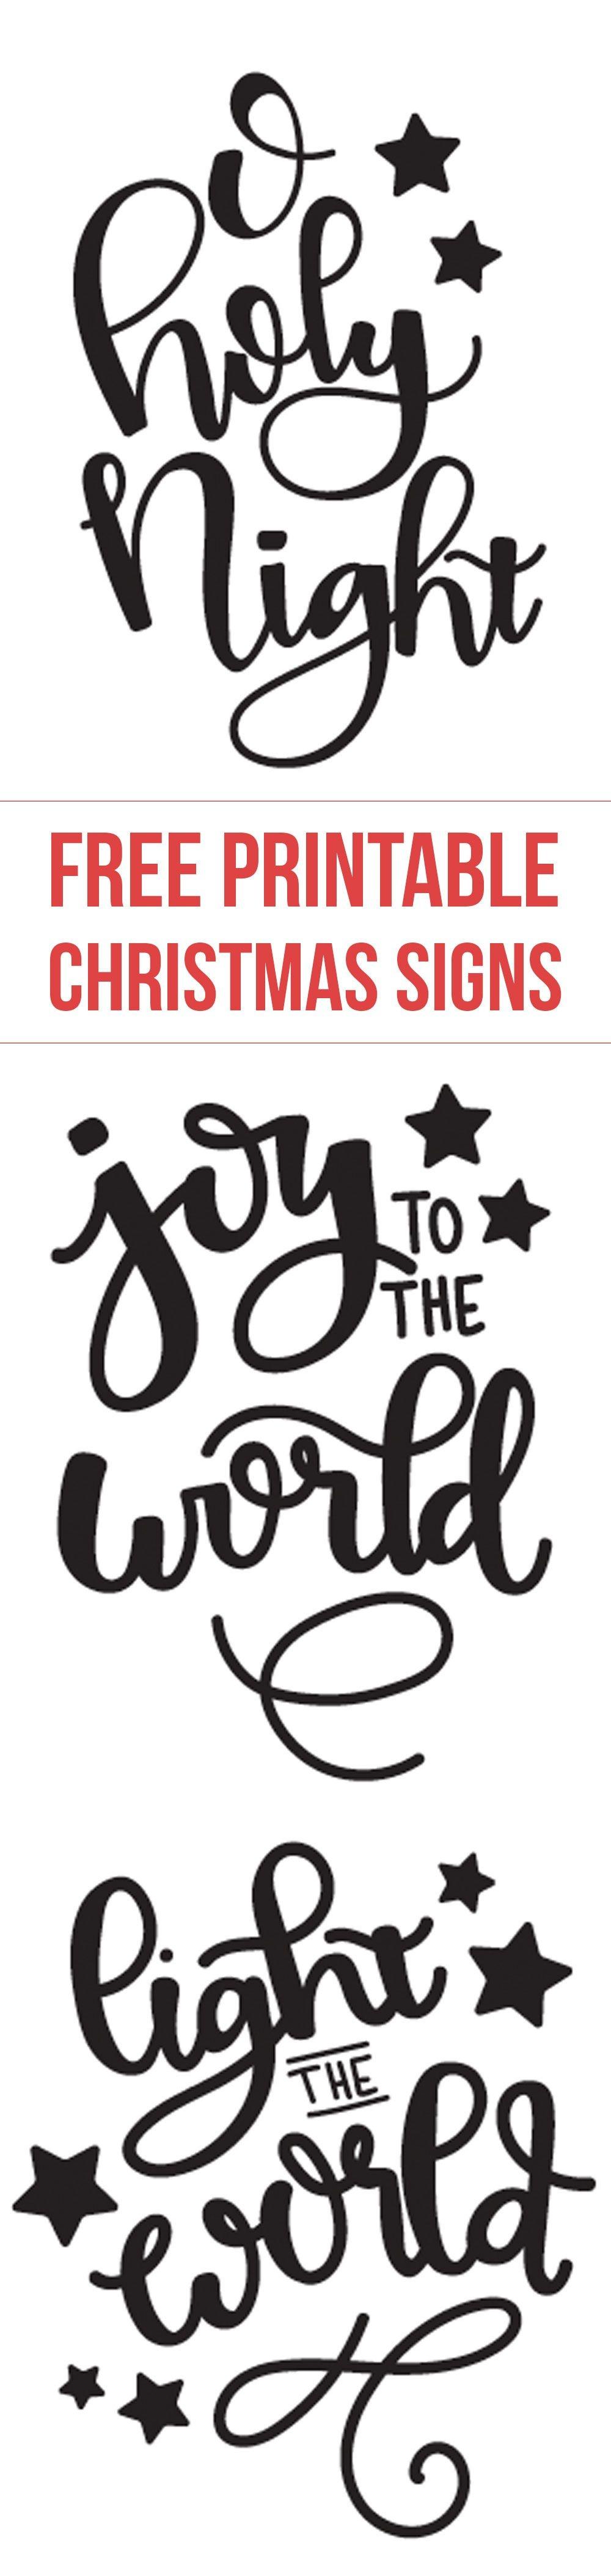 Light The World Designs | Live It. Love It. Lds. | Free Christmas - Free Printable Christmas Designs